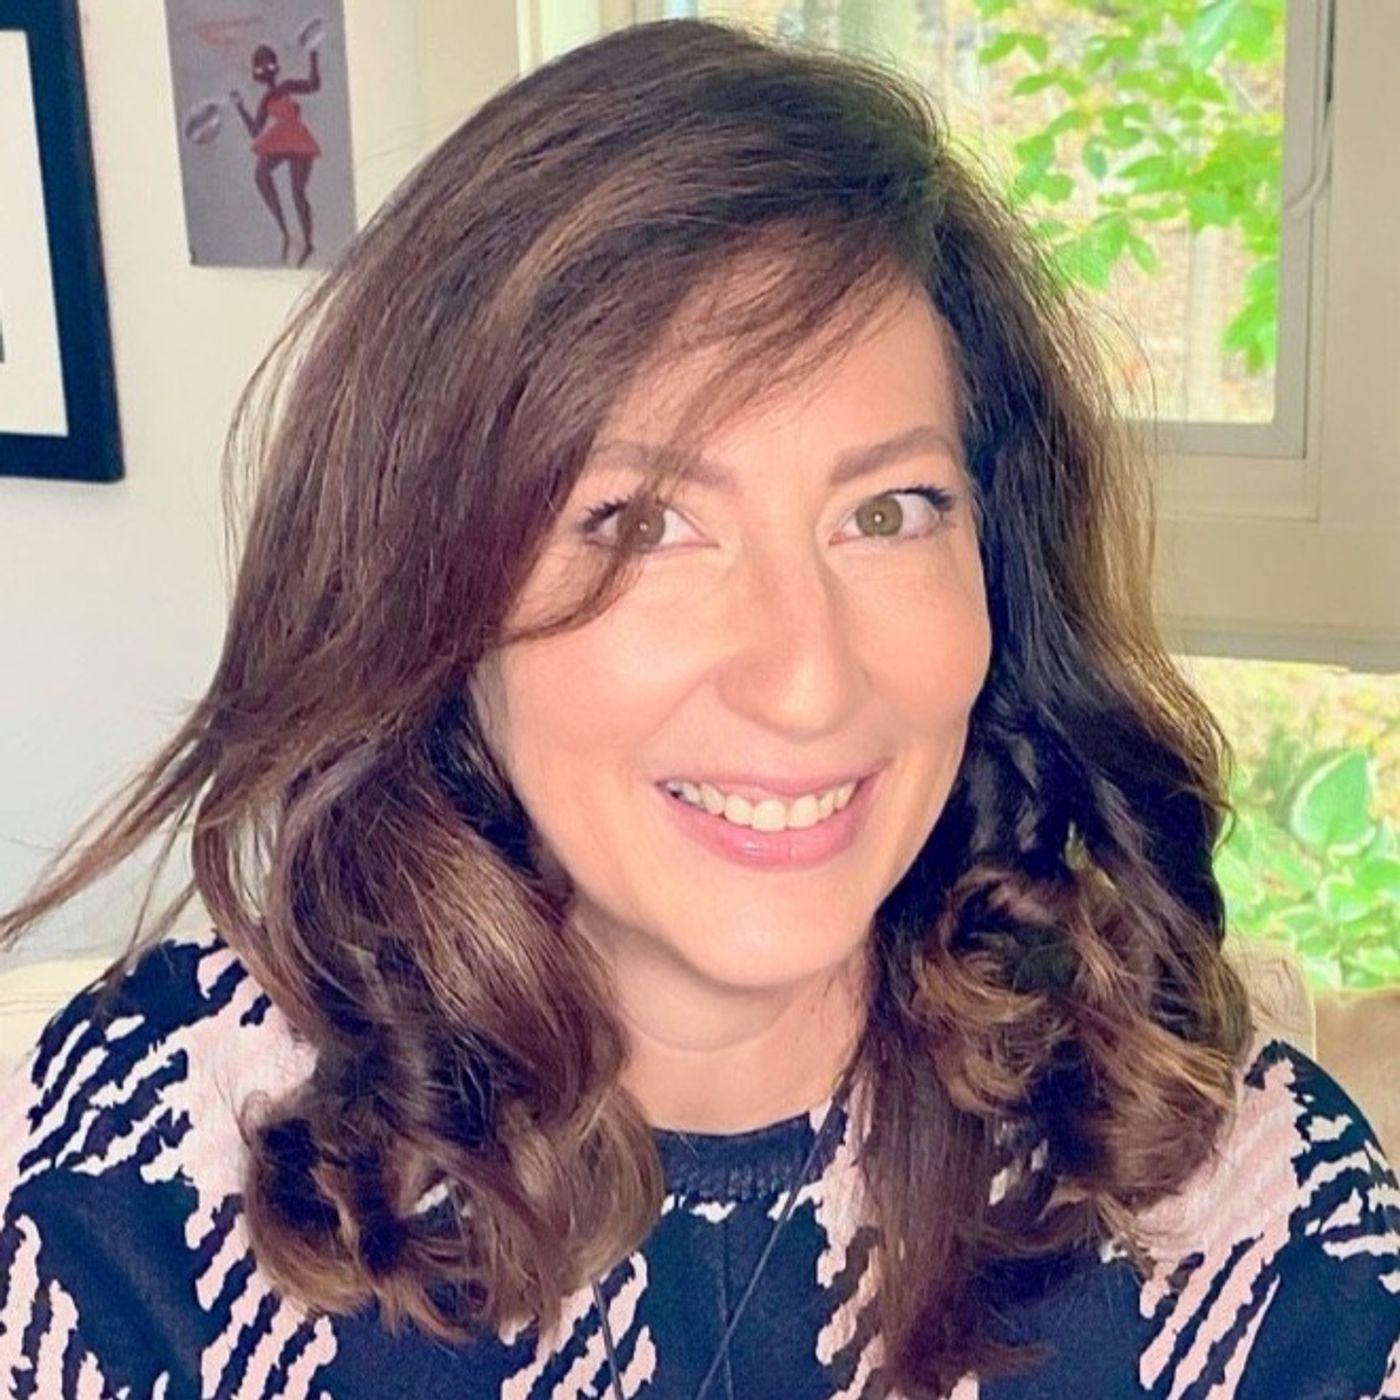 The InFOCUS Podcast: Ana Ceppi, Edelman